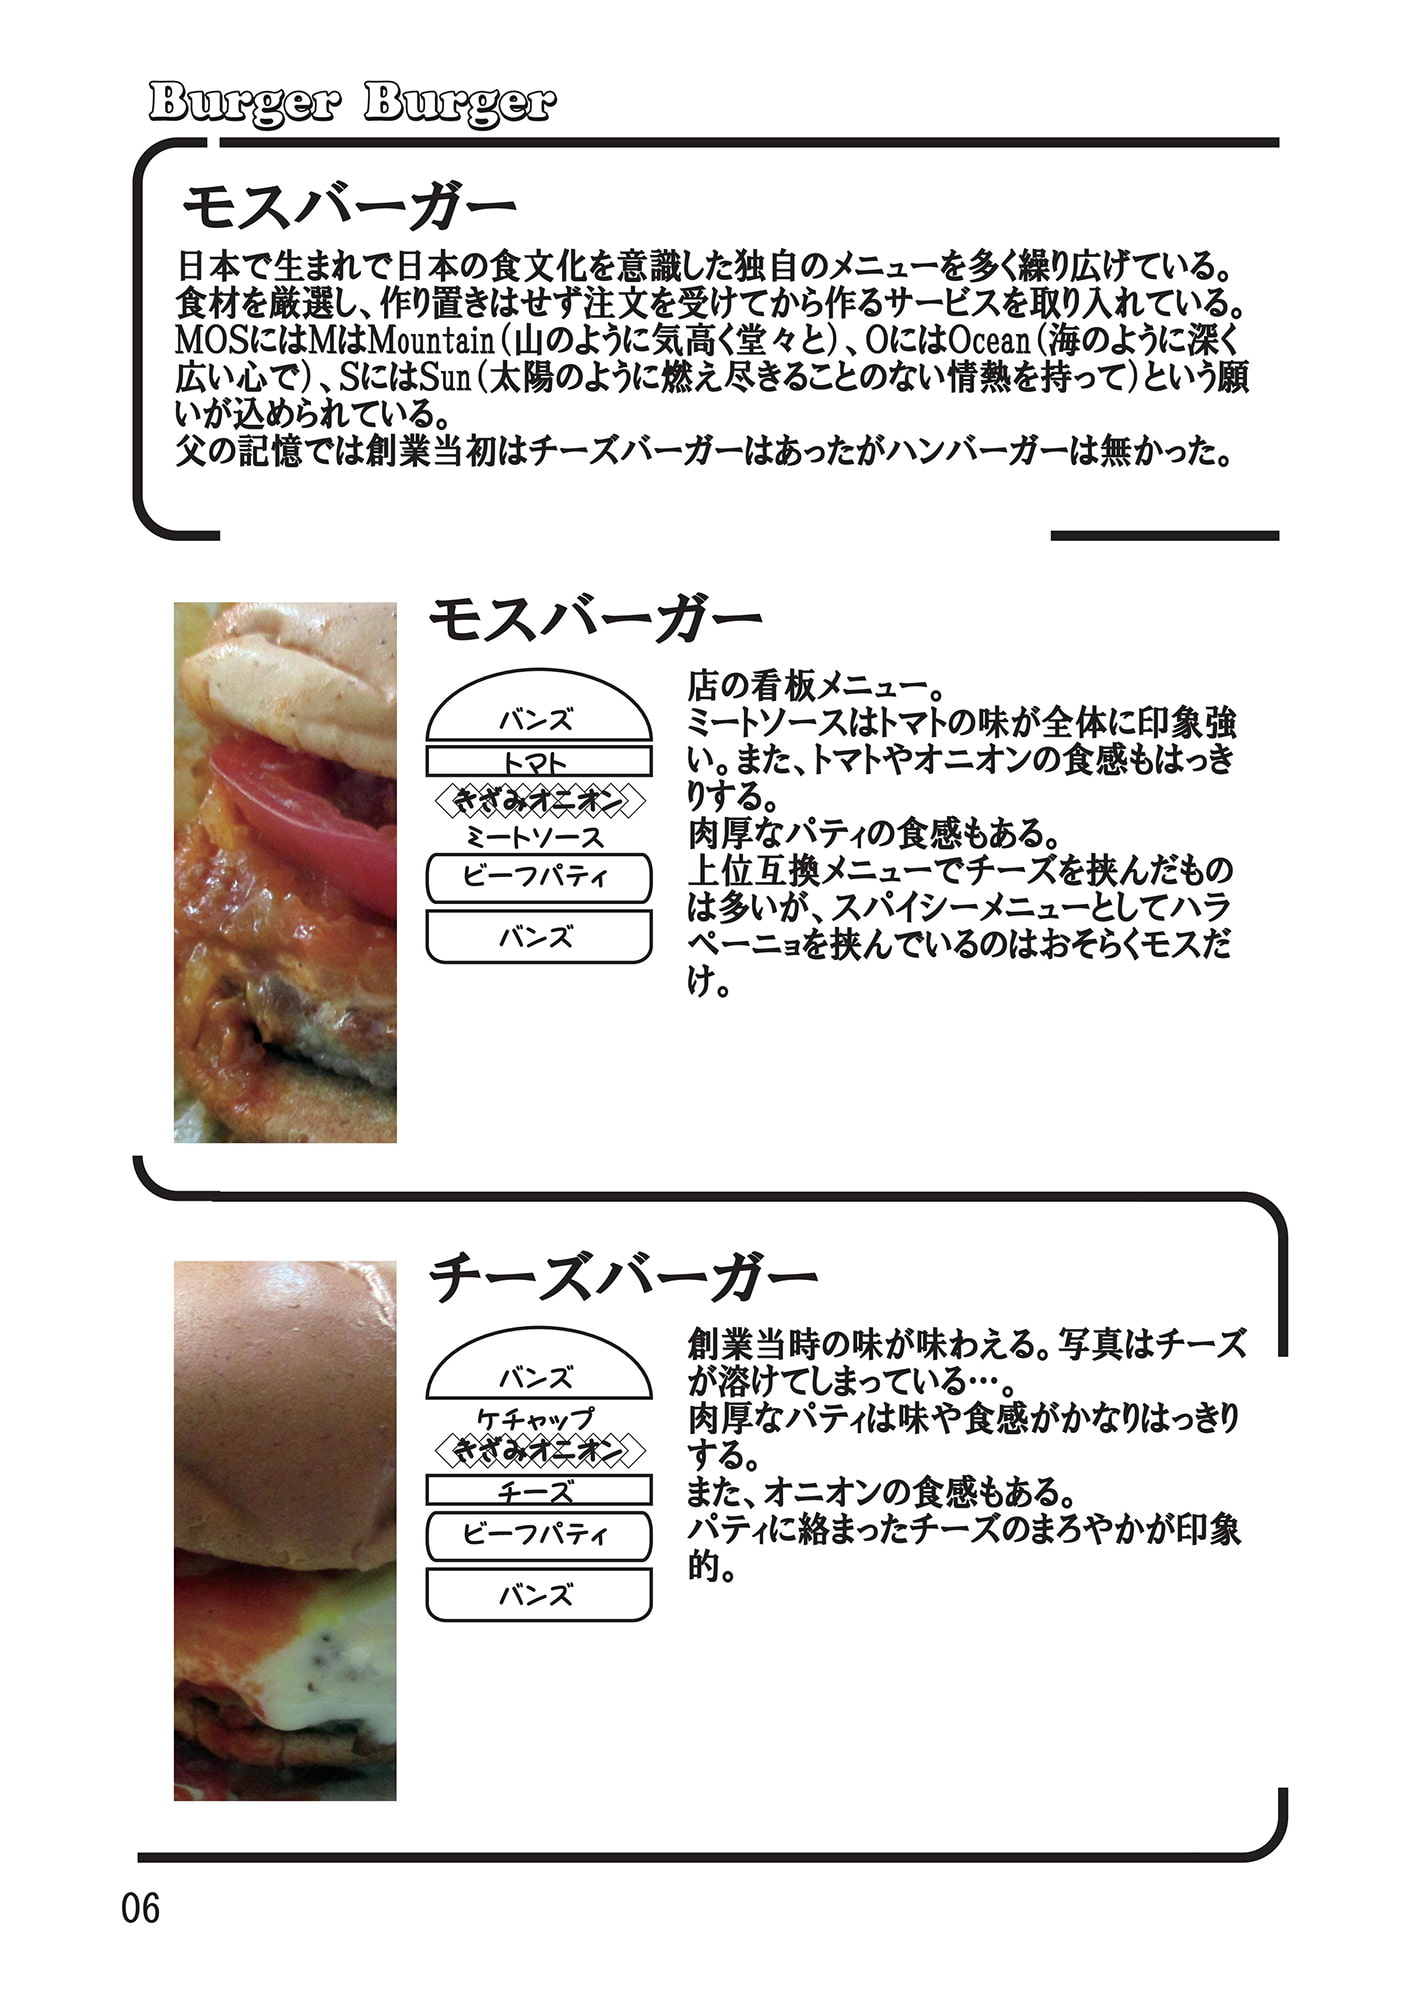 Burger Burger -都内主要ハンバーガーチェーン比較本-